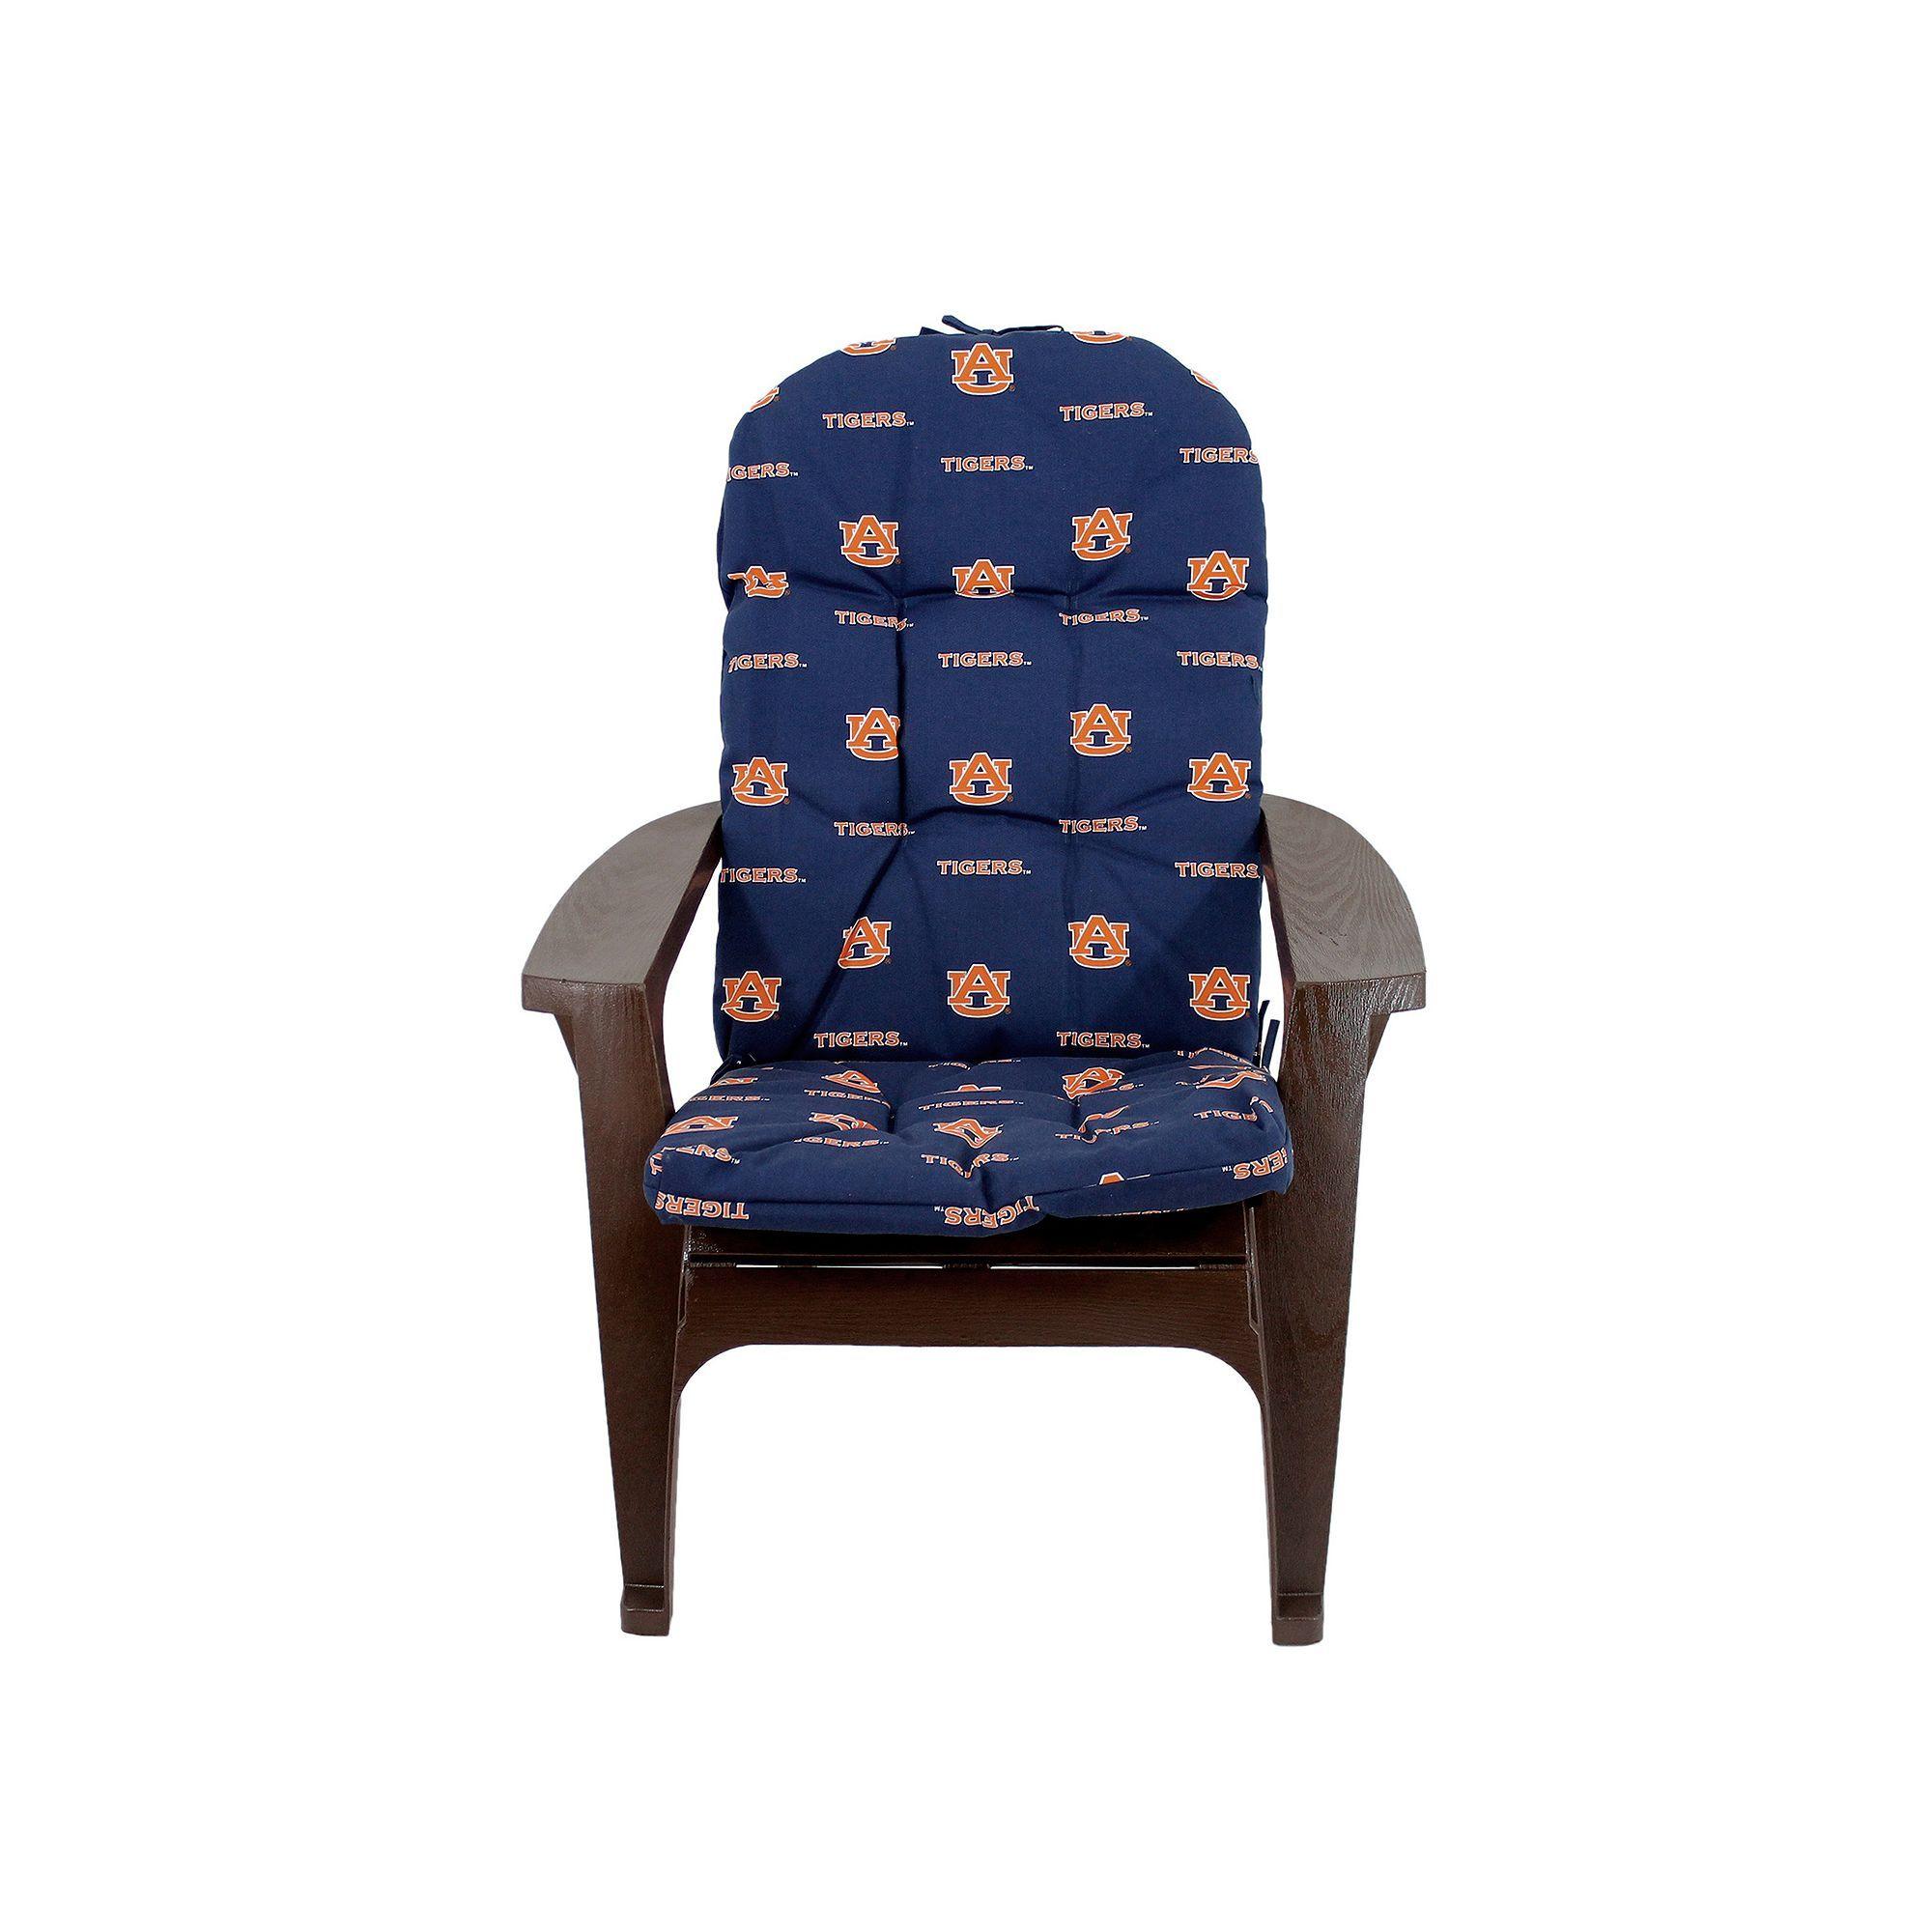 Kohlus auburn tigers adirondack chair cushion adirondack chair